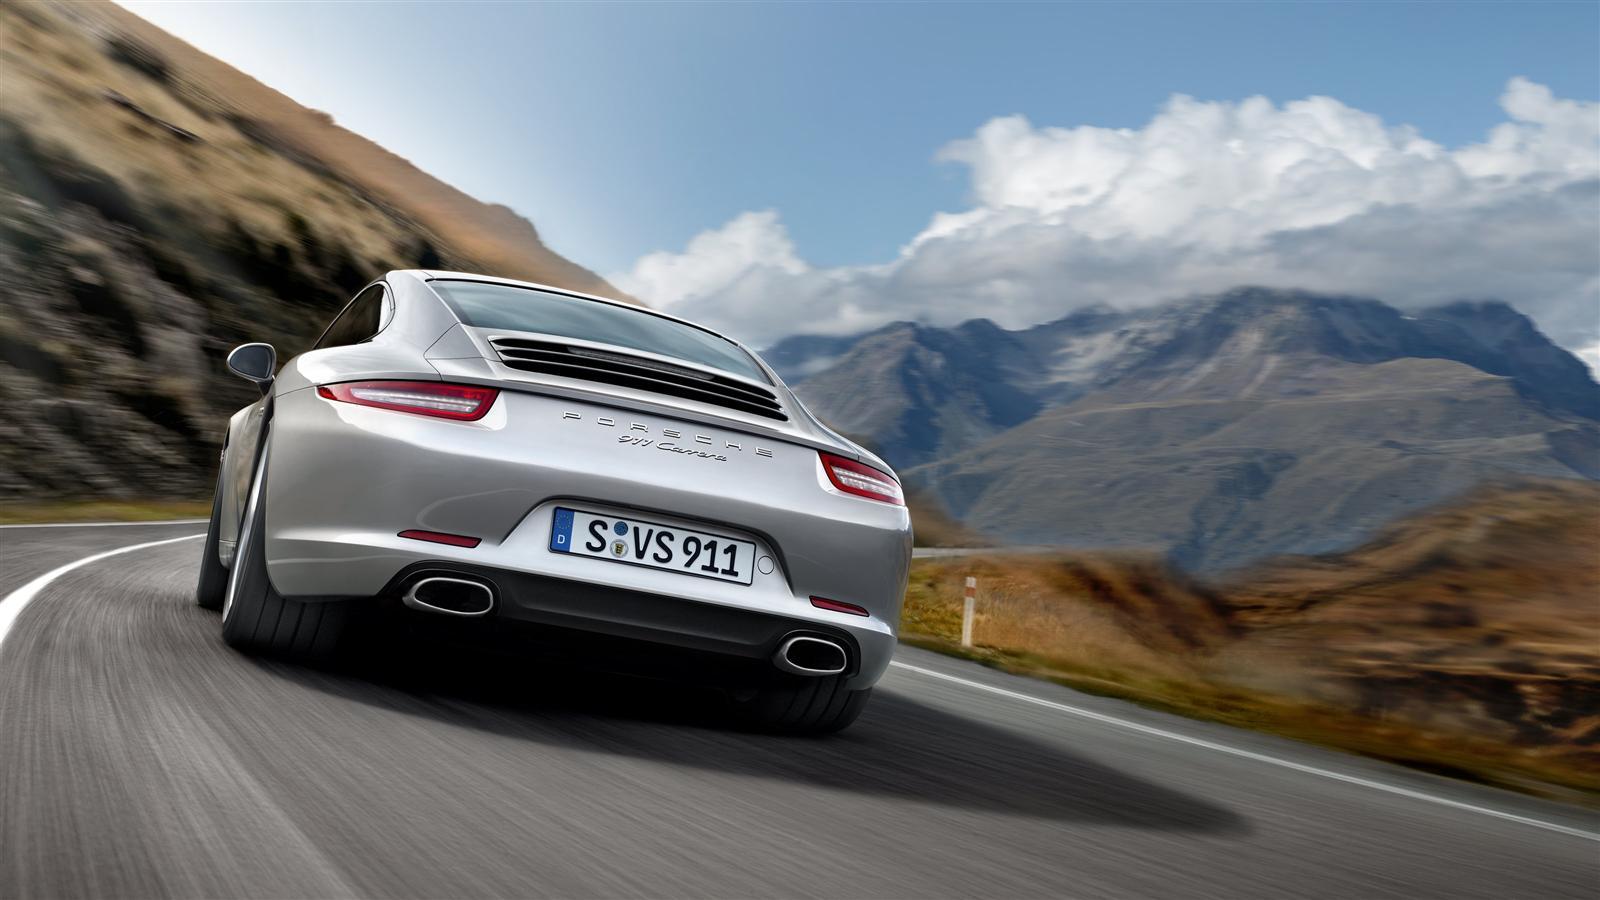 Porsche 911 Carrera /usite/1132/images/911_gal7.jpg